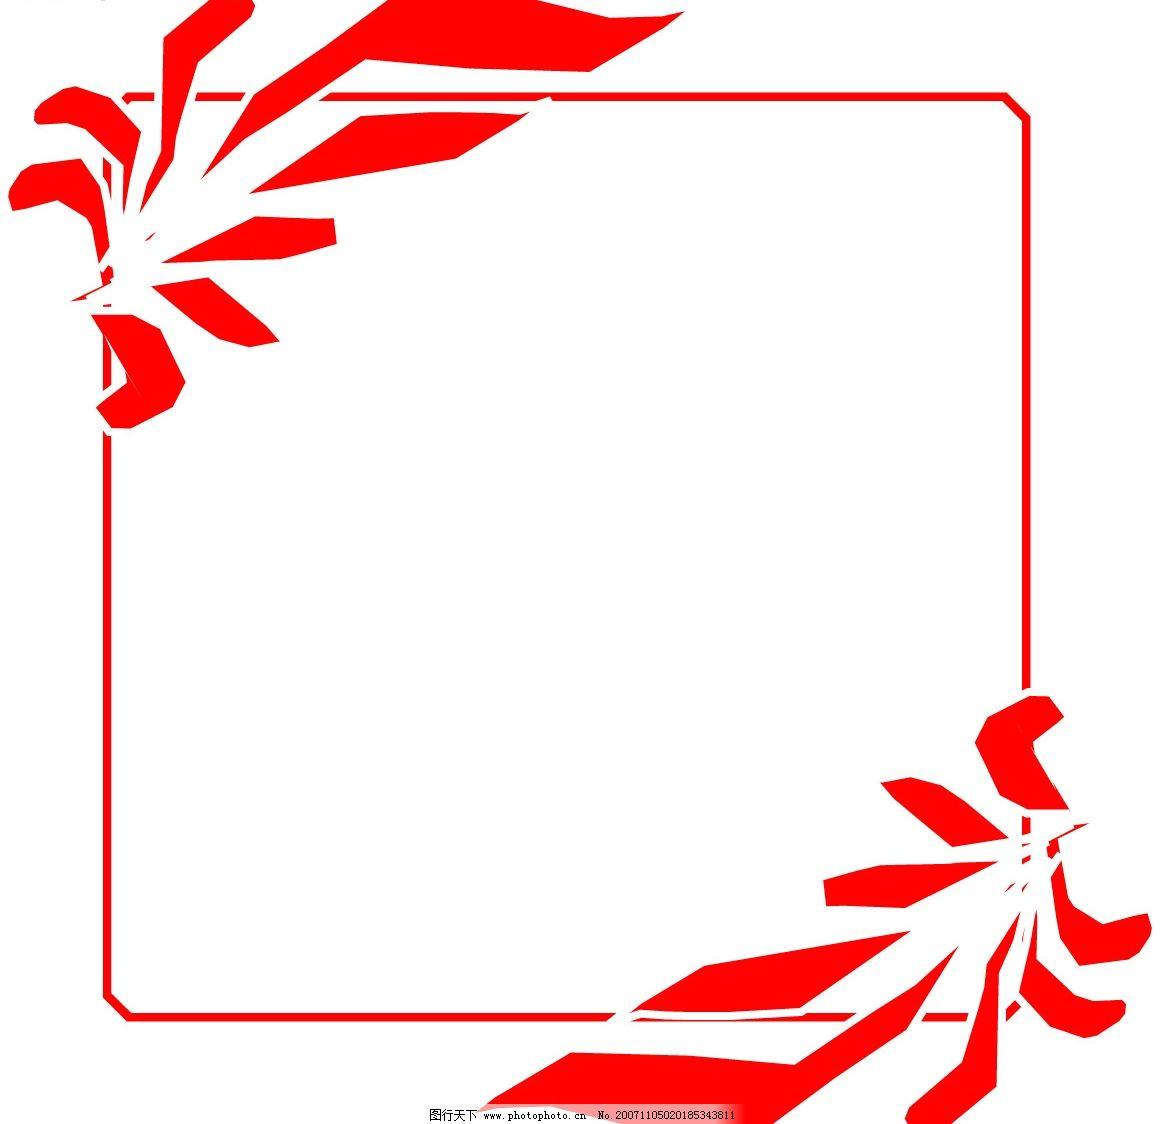 ppt 背景 背景图片 边框 模板 设计 矢量 矢量图 素材 相框 1160_112